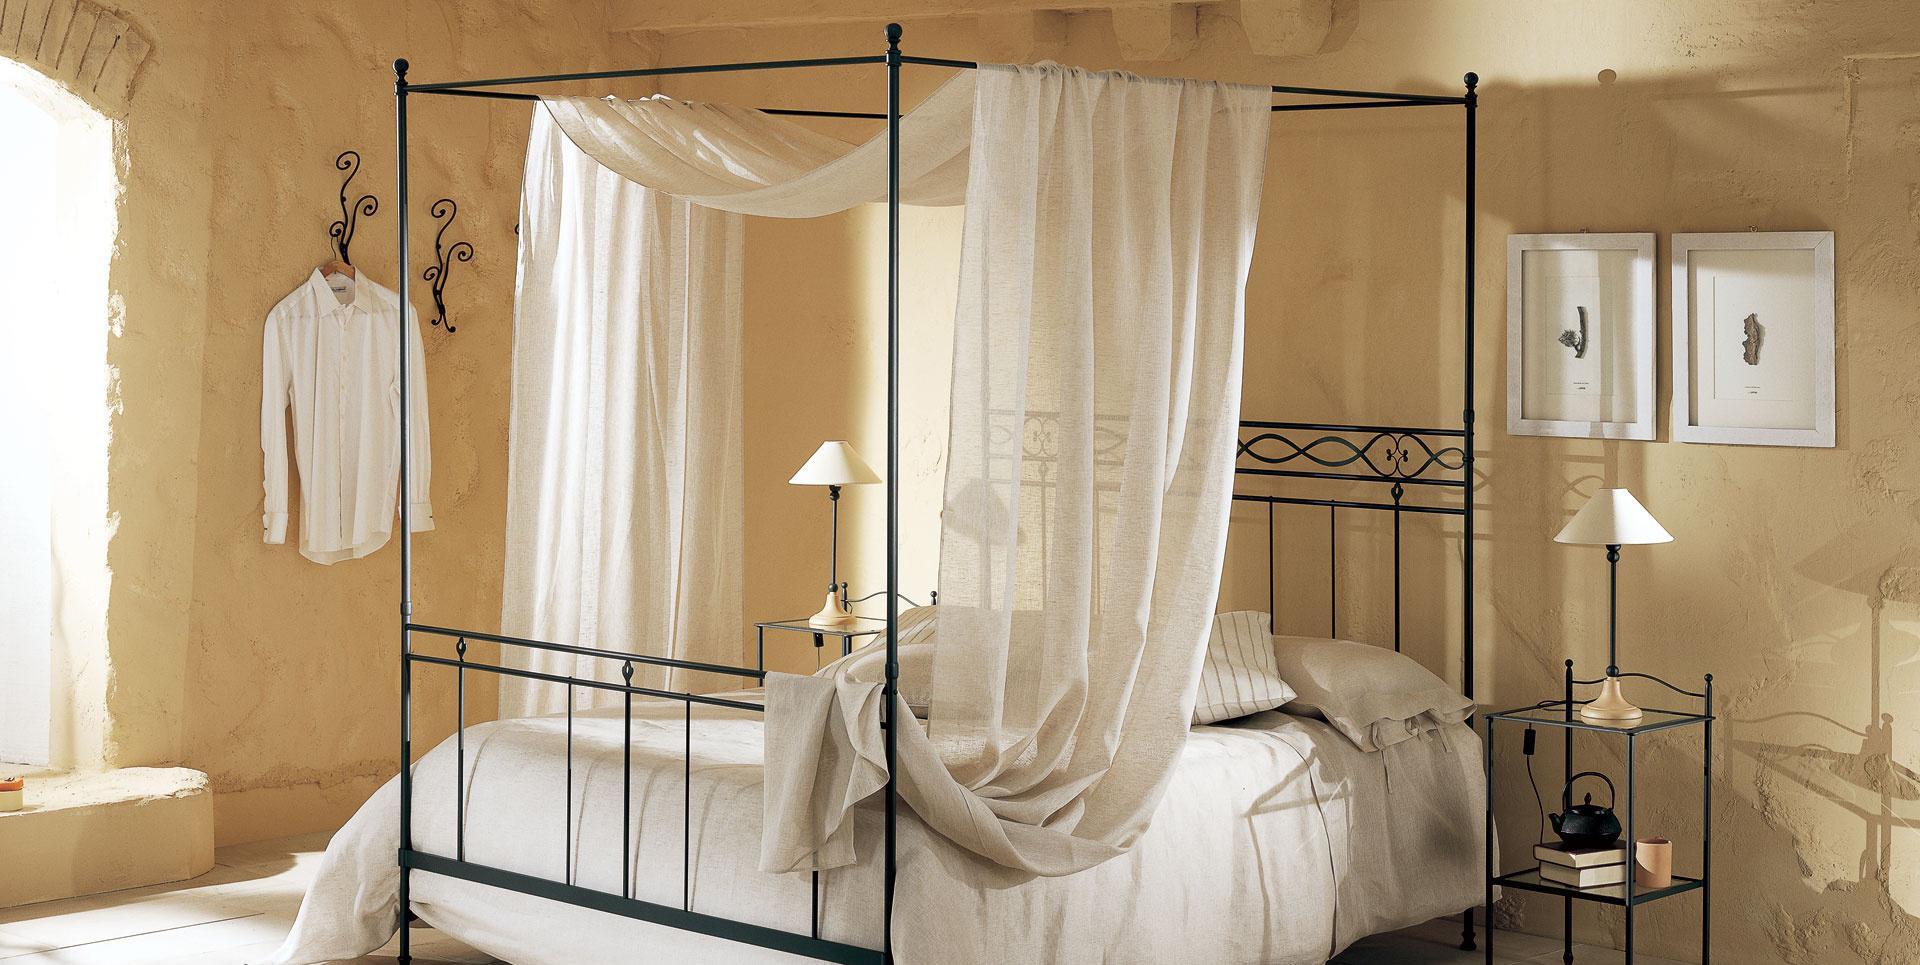 Льняной полупрозрачный балдахин на раме кровати